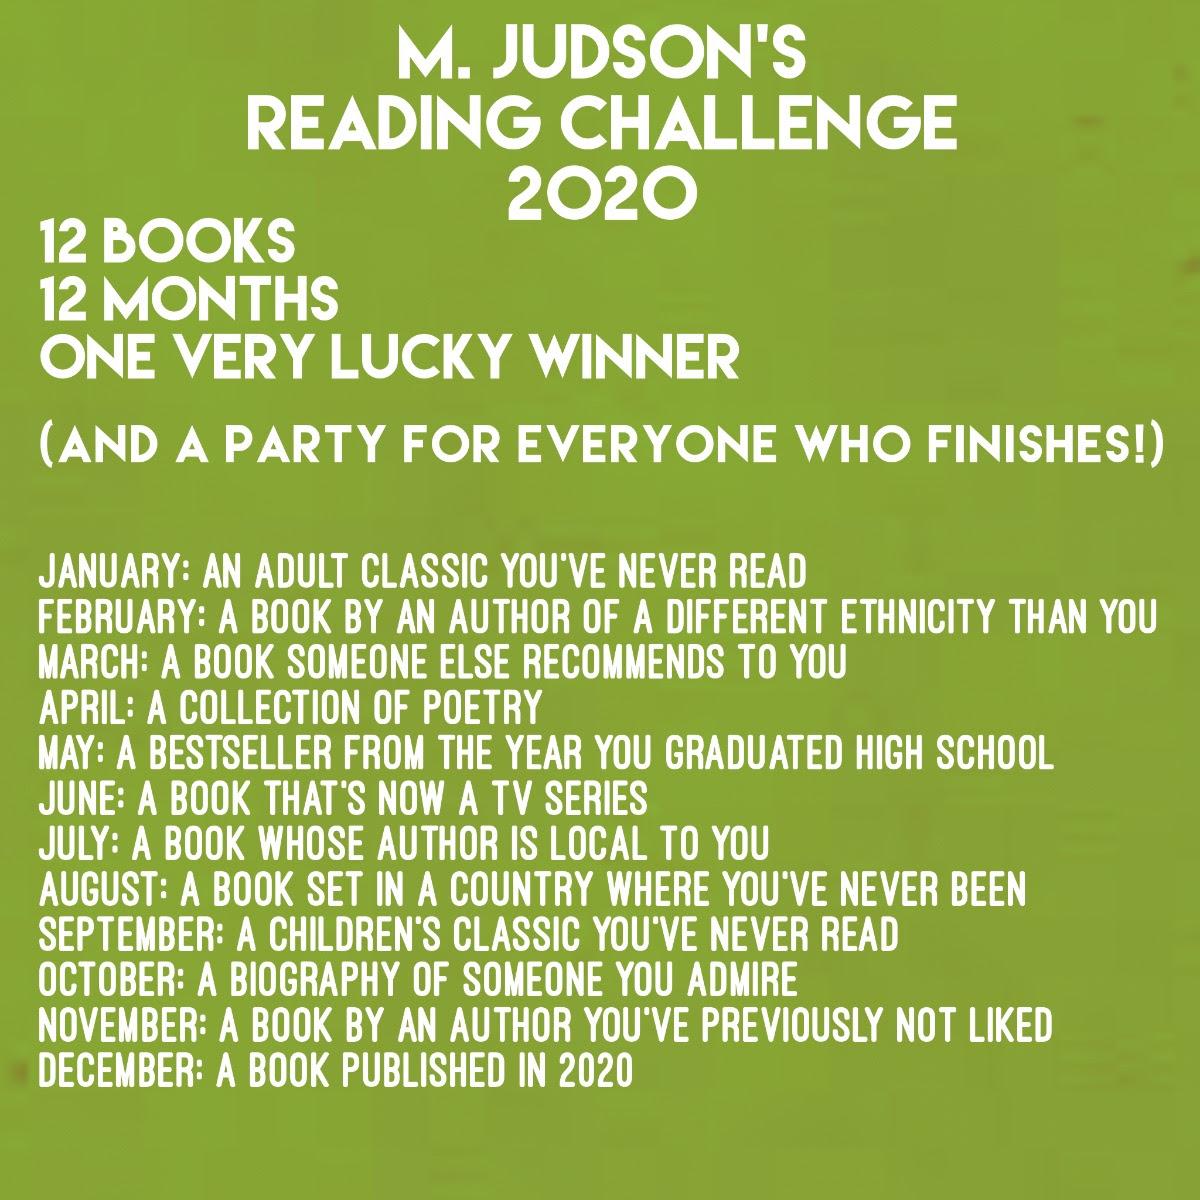 Ridgewaygirl Reads Some Books In 2020 Second Quarter 2020